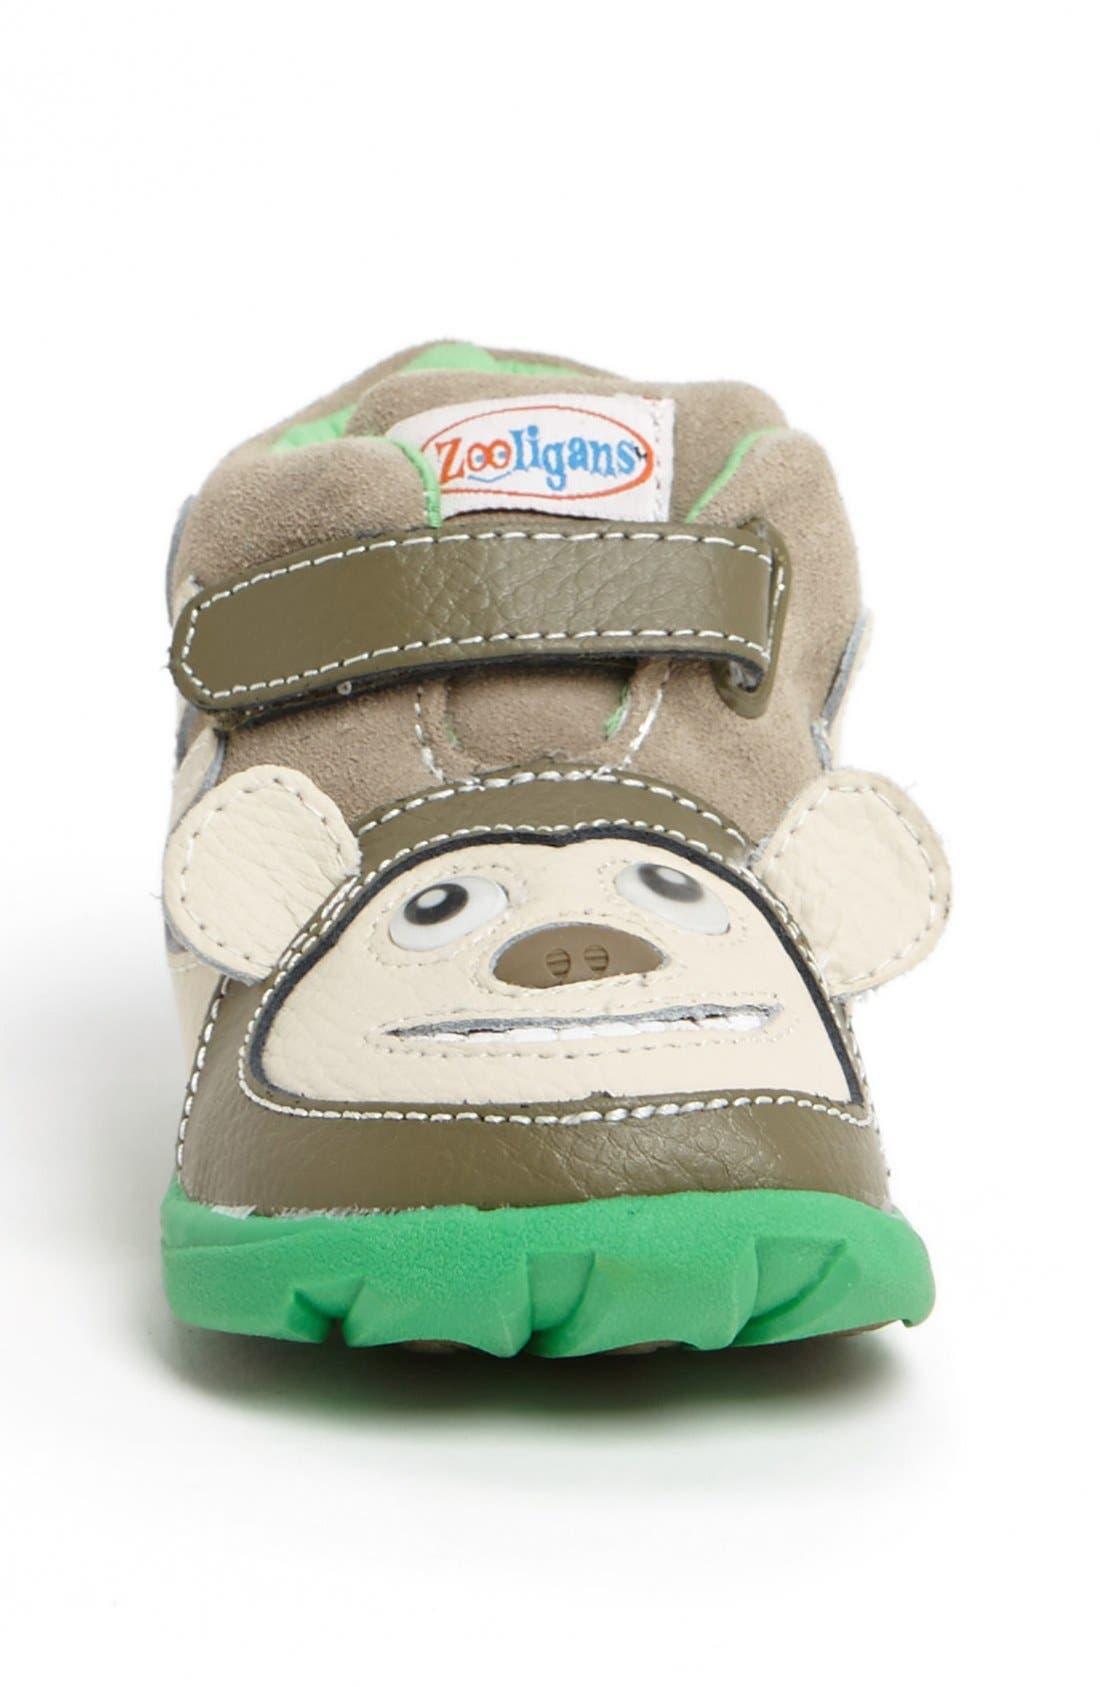 Alternate Image 3  - Zooligans™ 'Bobo the Monkey' Sneaker (Baby, Walker, Toddler & Little Kid)